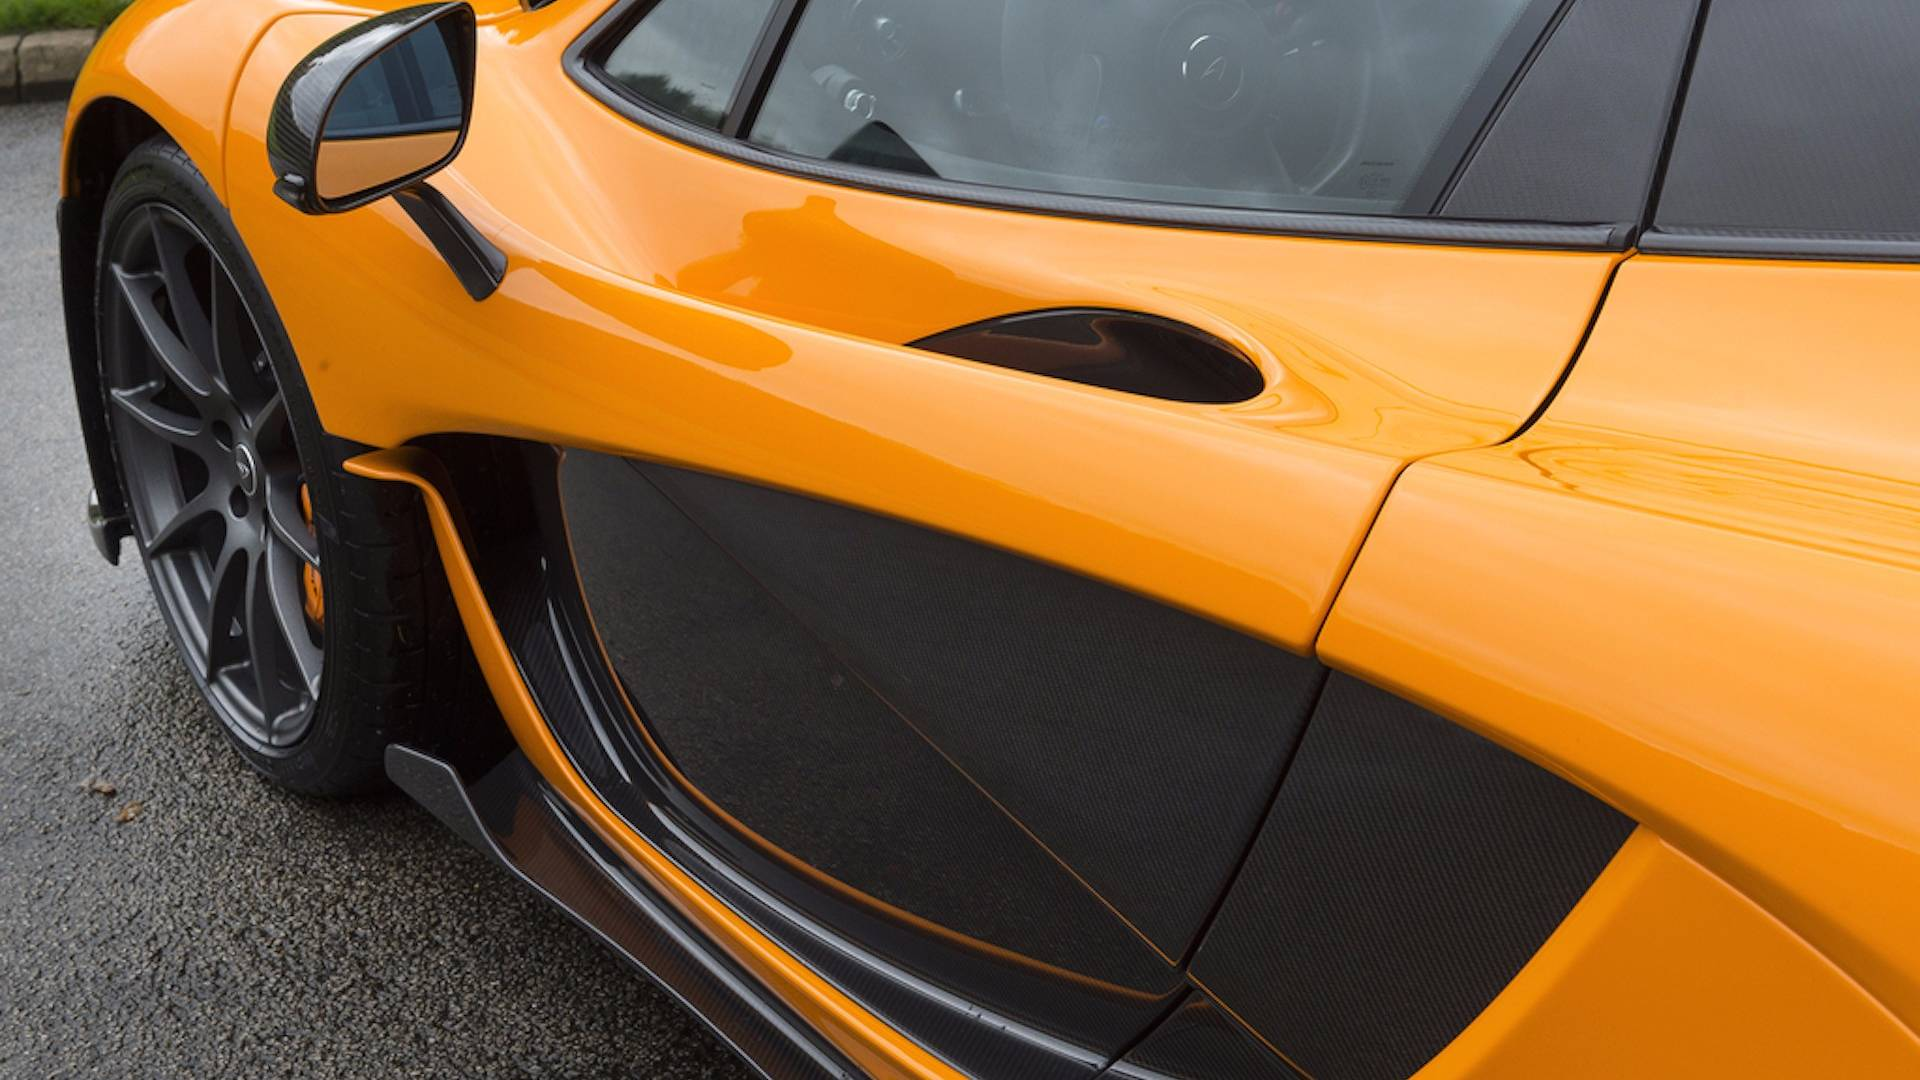 McLaren_P1_Experimental_Prototype_31